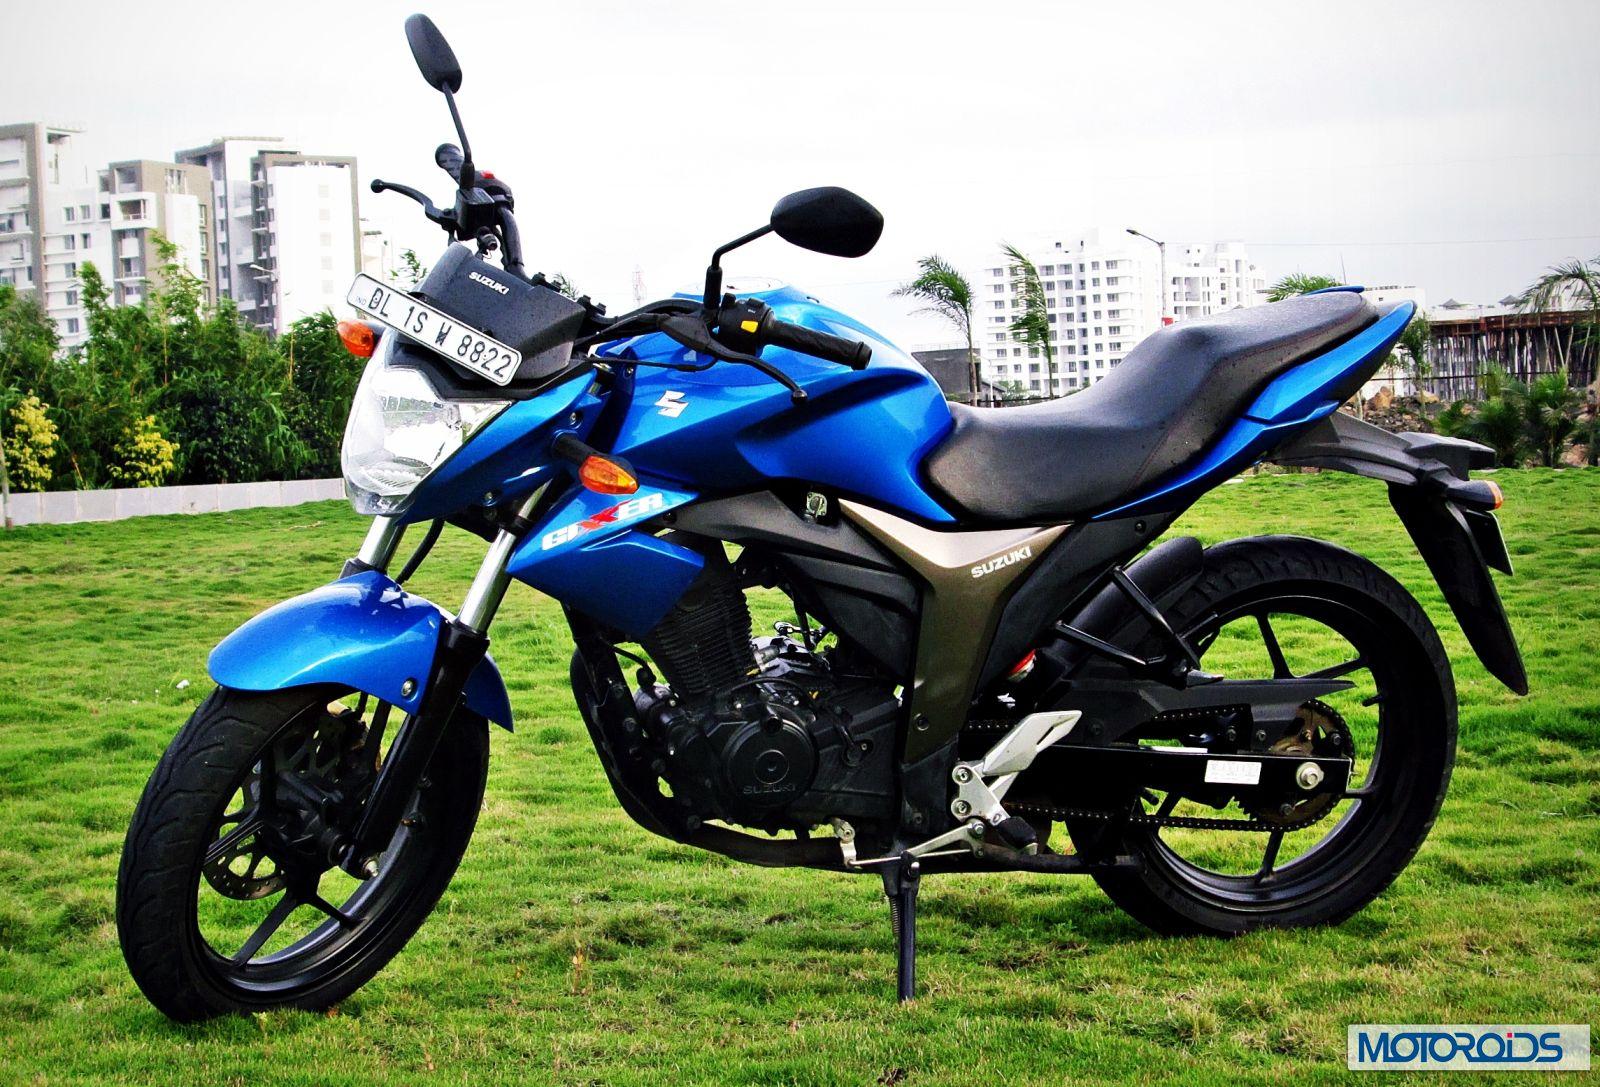 Suzuki Tire Size >> Suzuki-Gixxer-155-Review-Image (18)